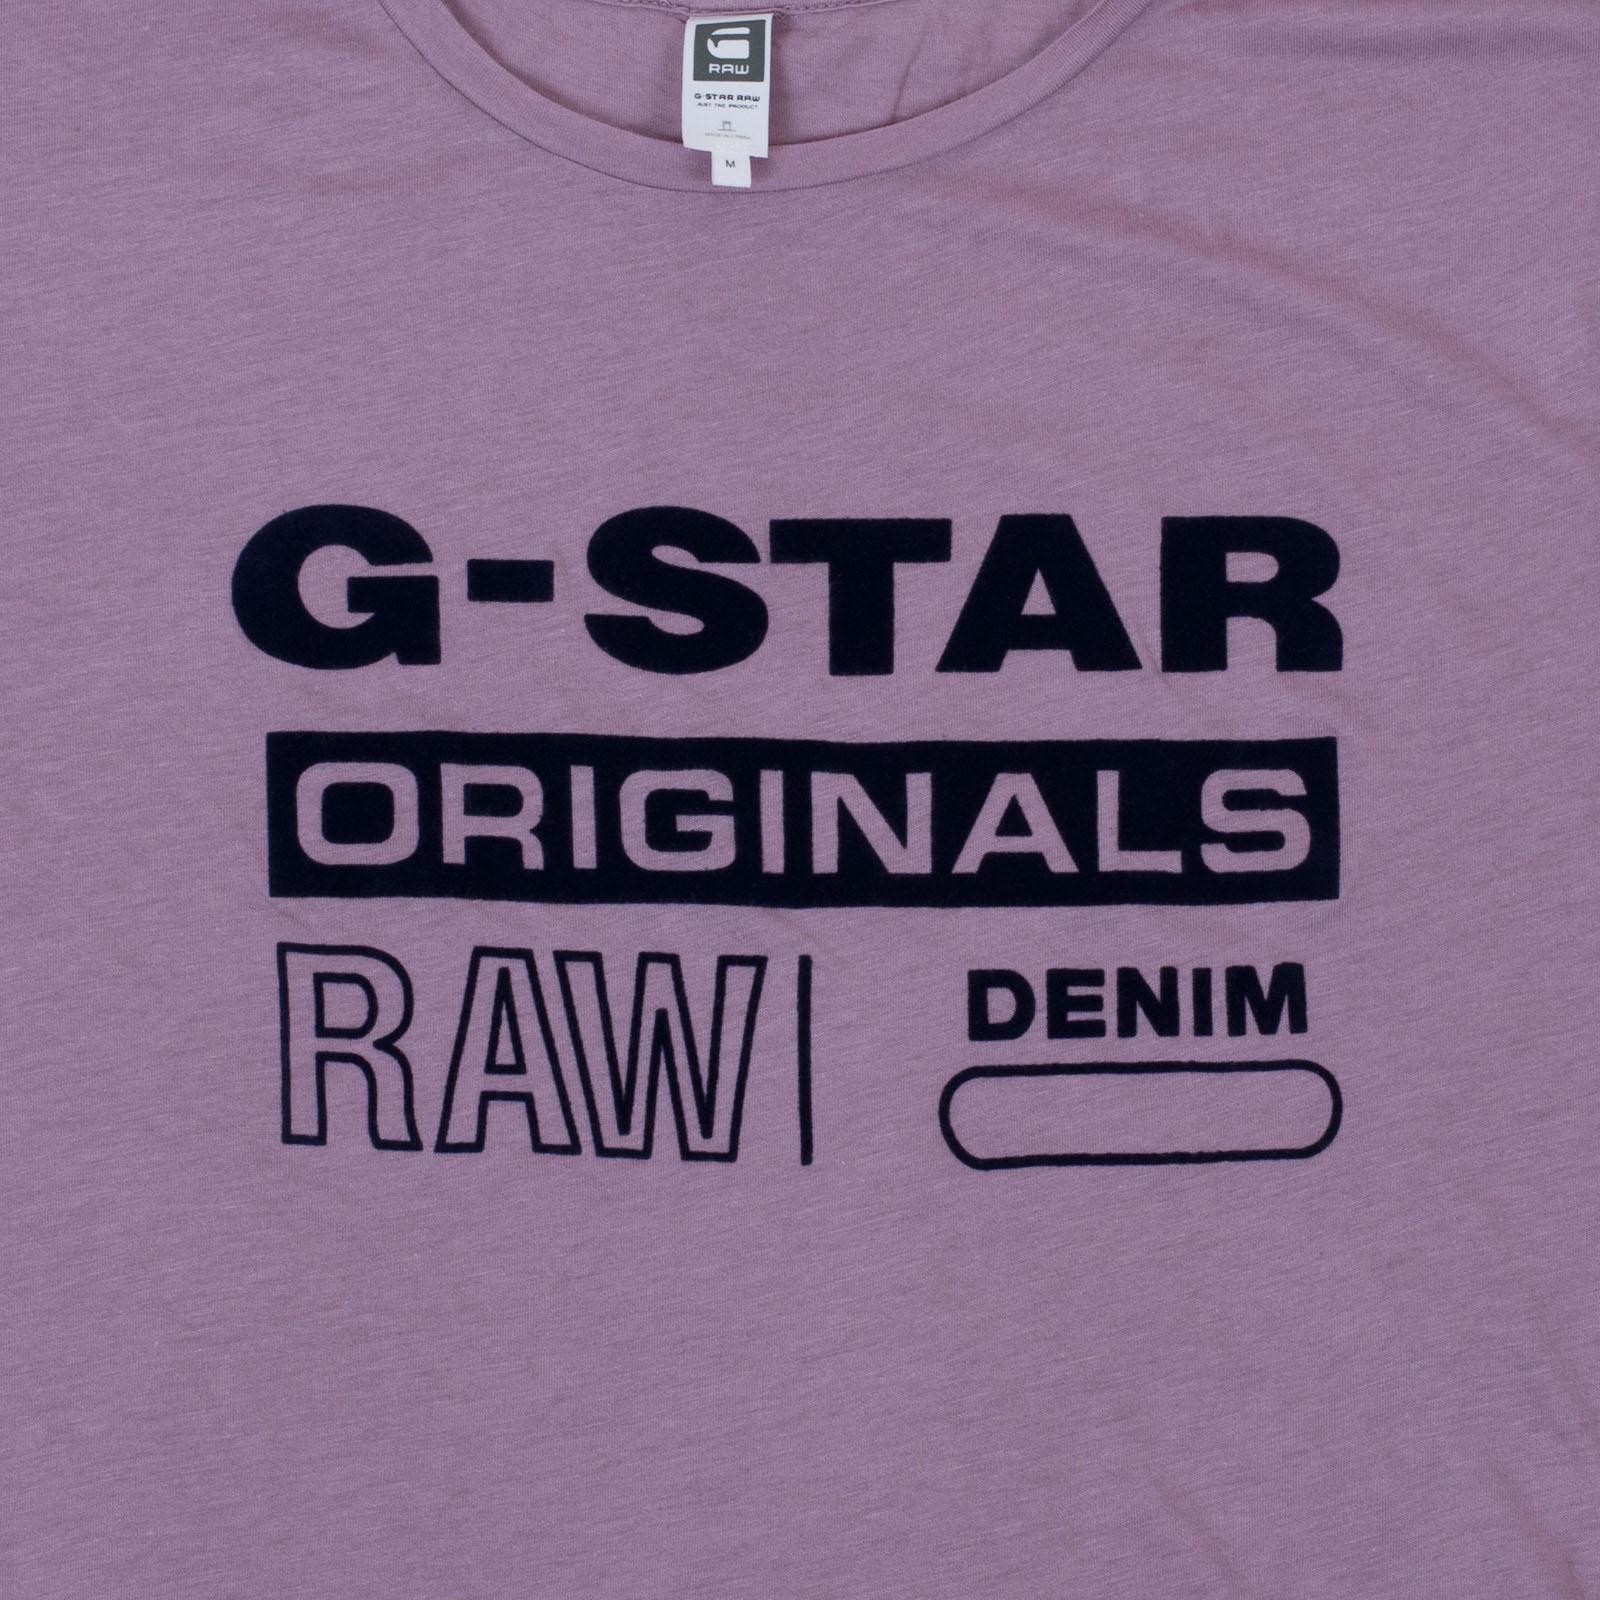 Футболка от классиков стиля деним G-Star Raw®